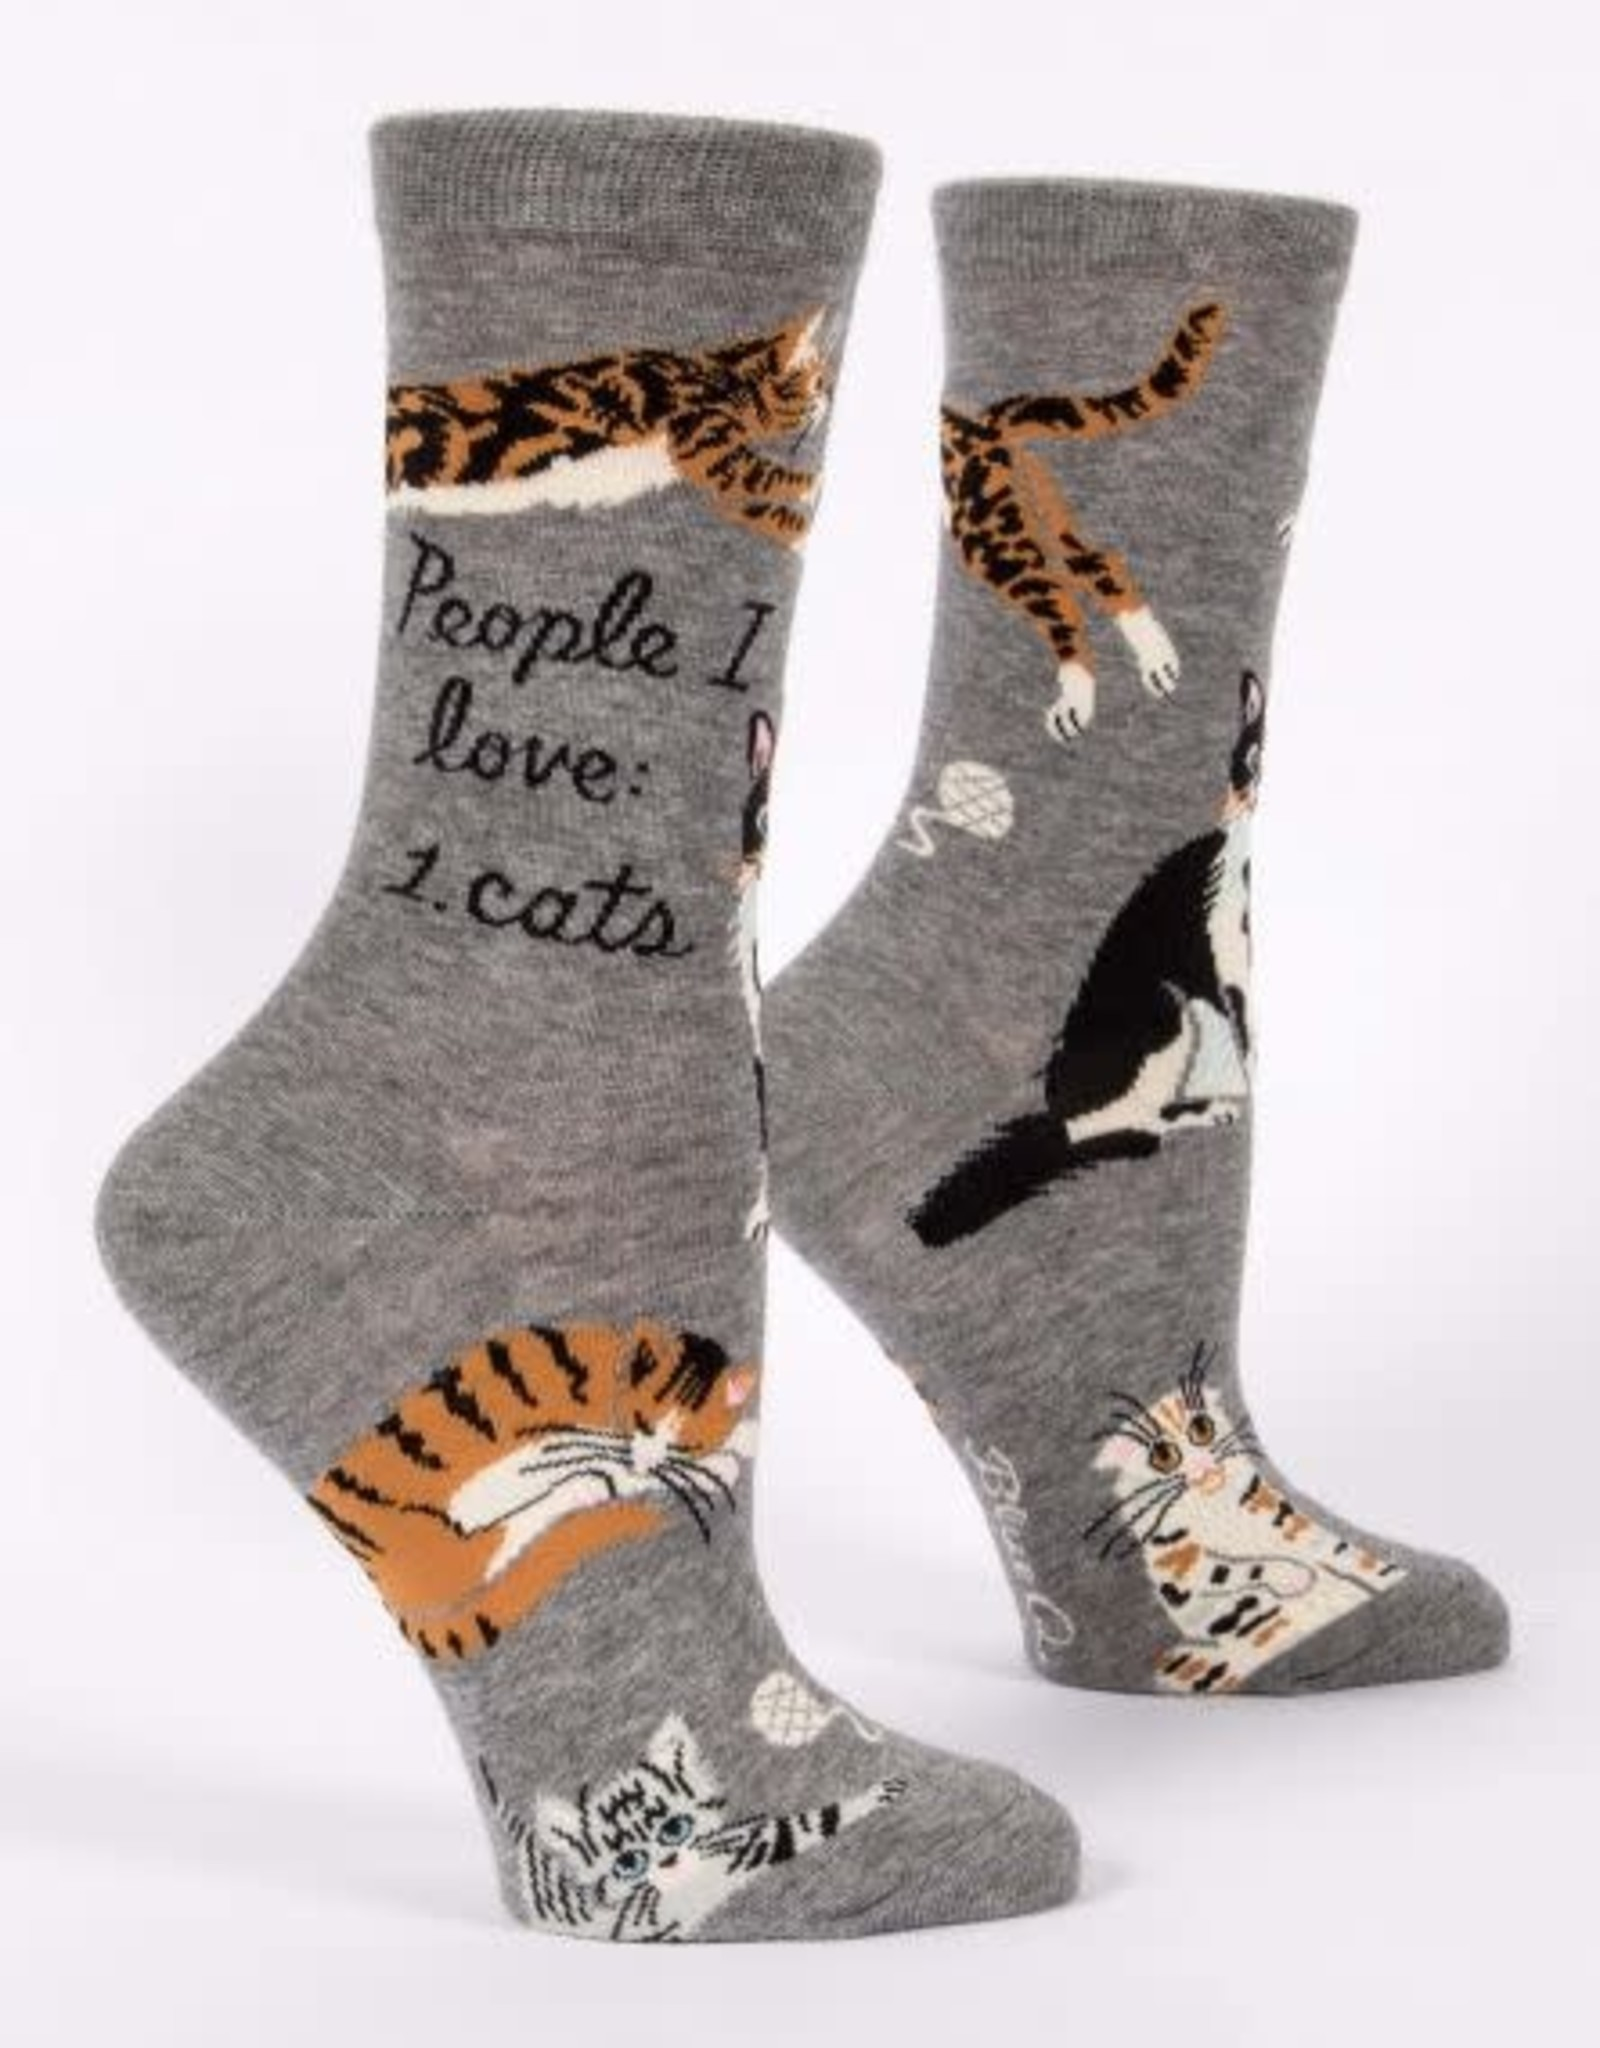 Blue Q People I Love Socks